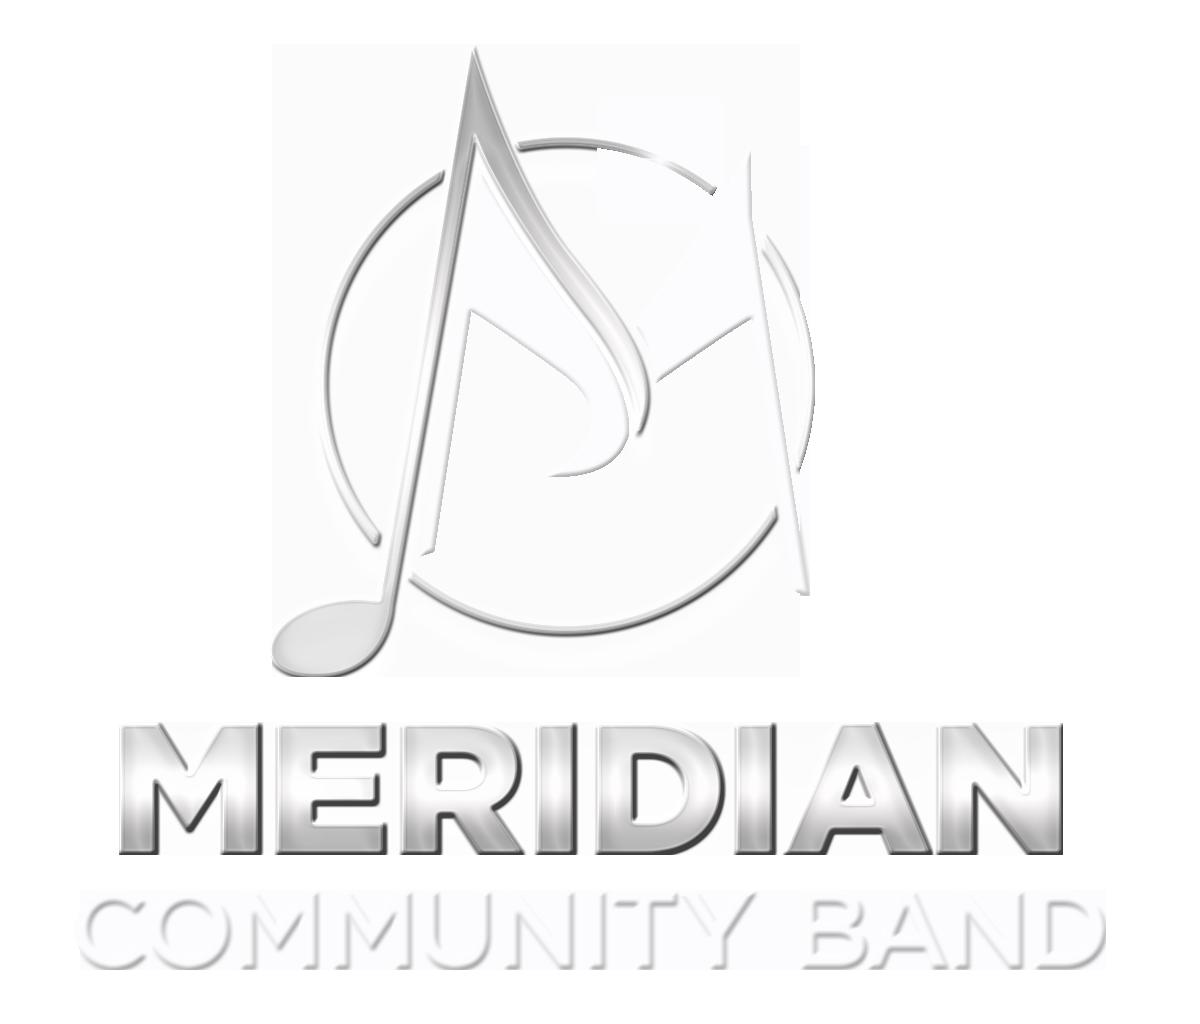 Meridian Community Band